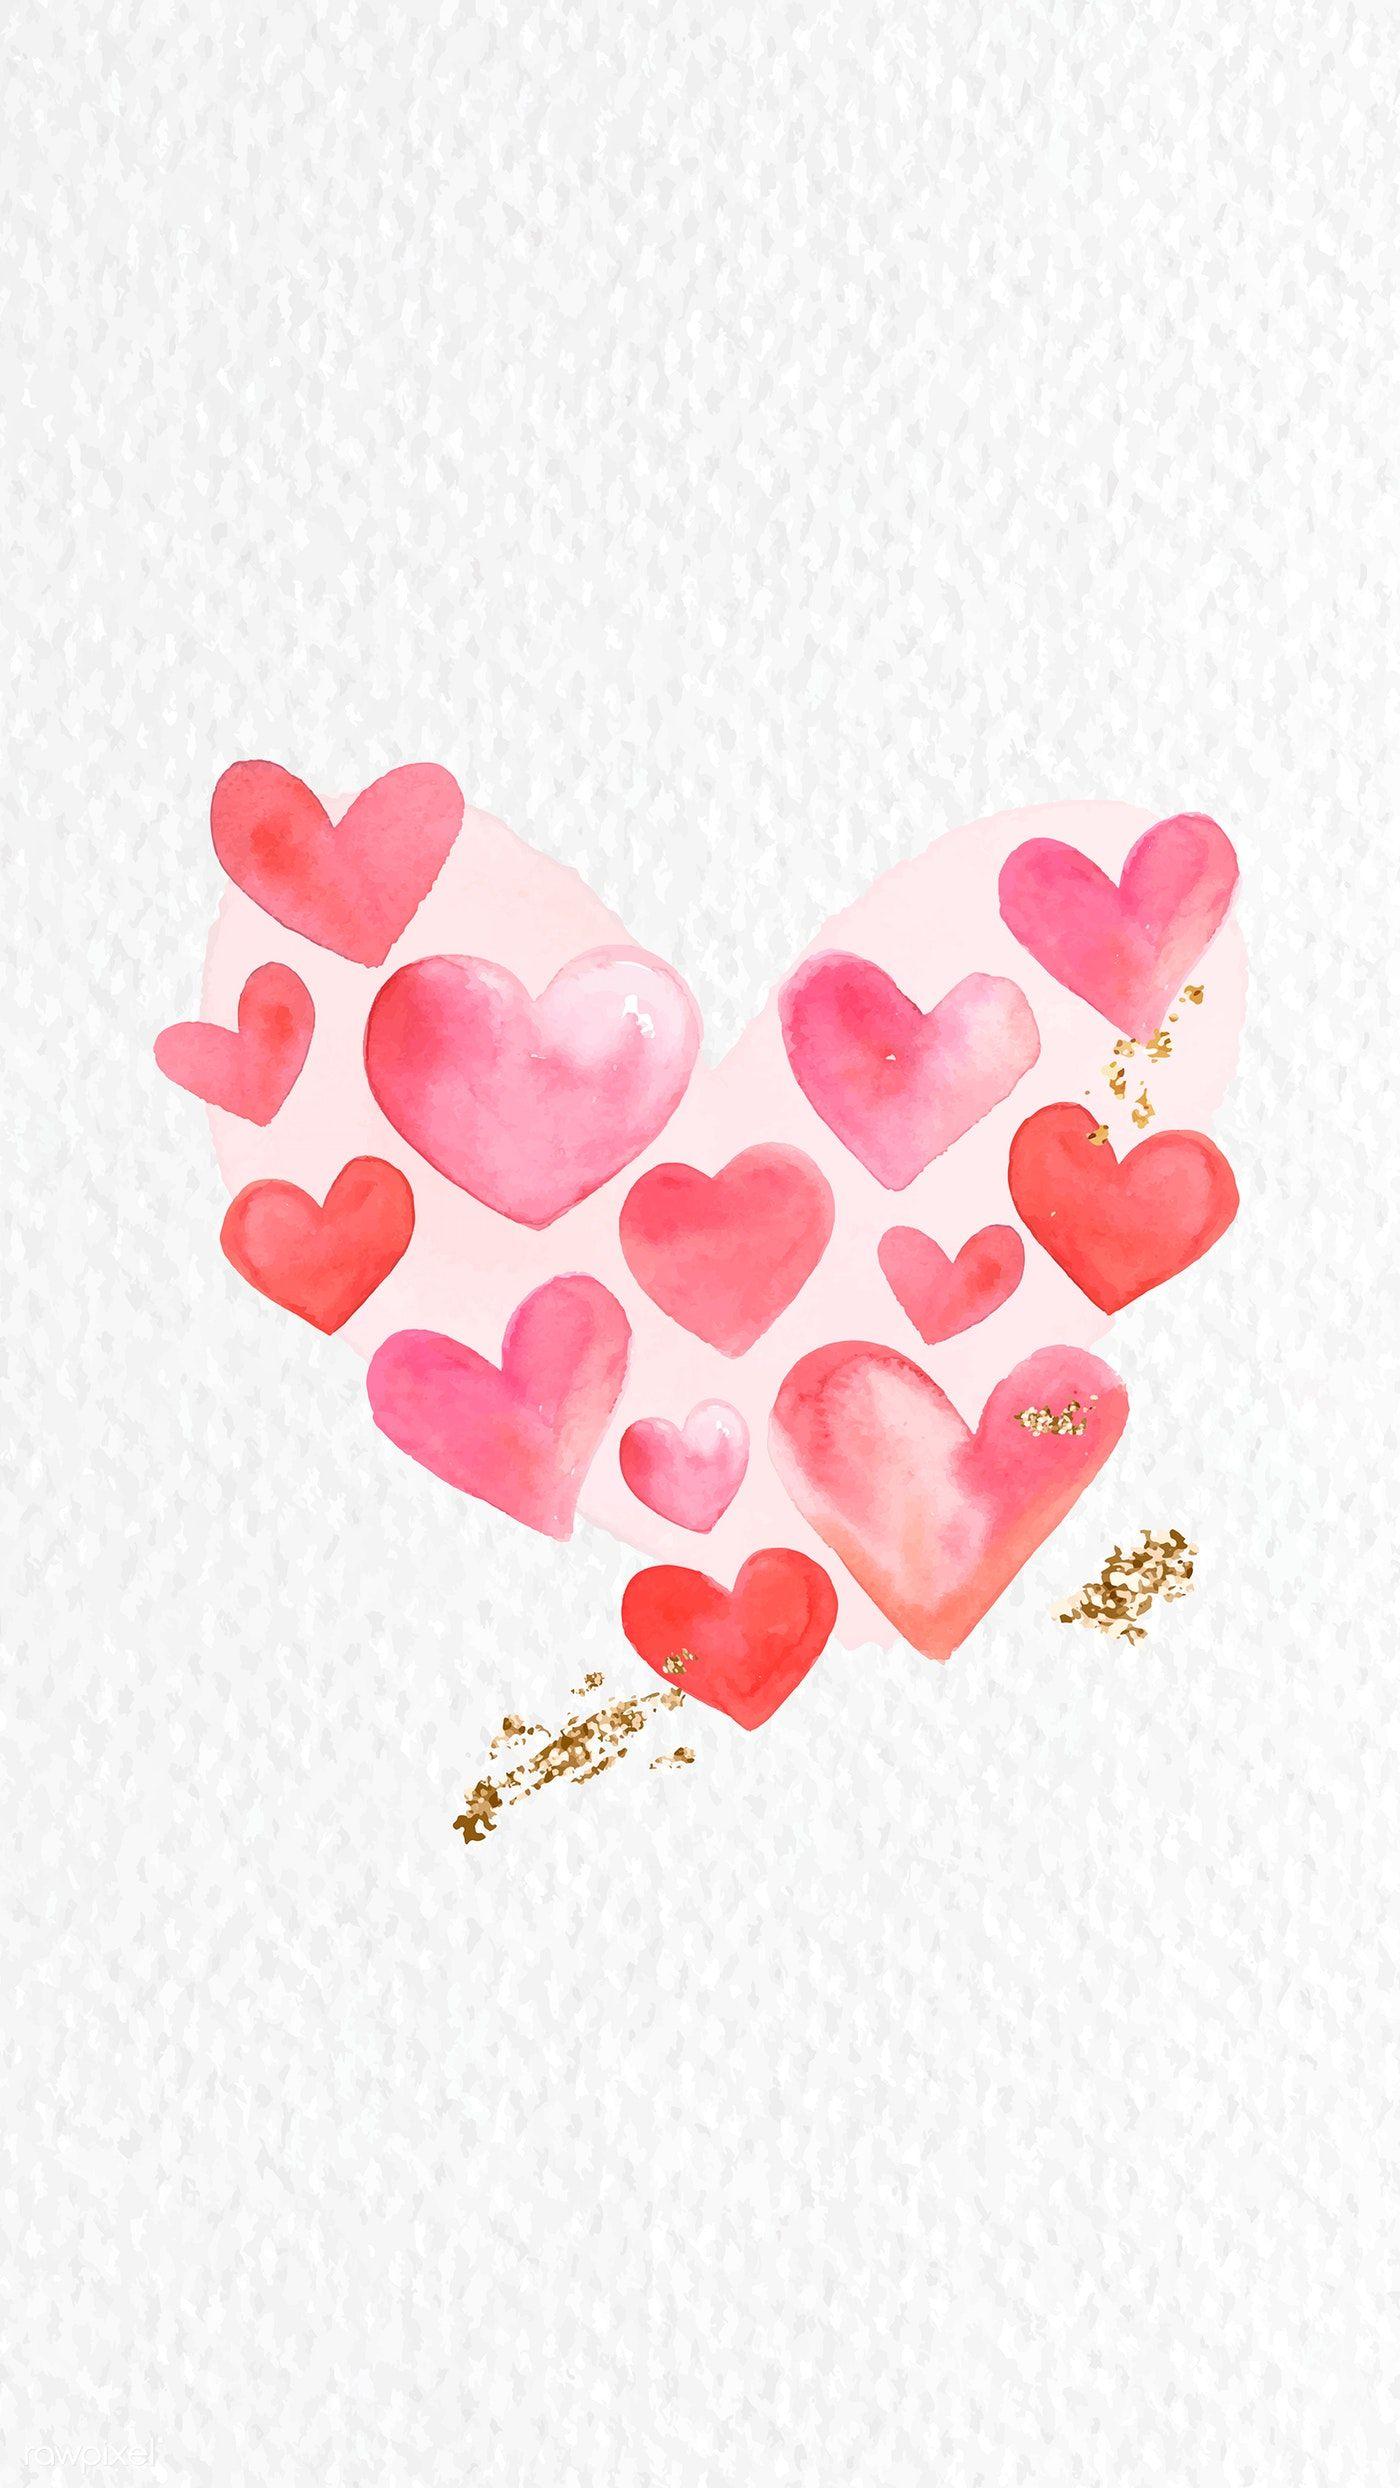 Download premium vector of Red heart watercolor phone